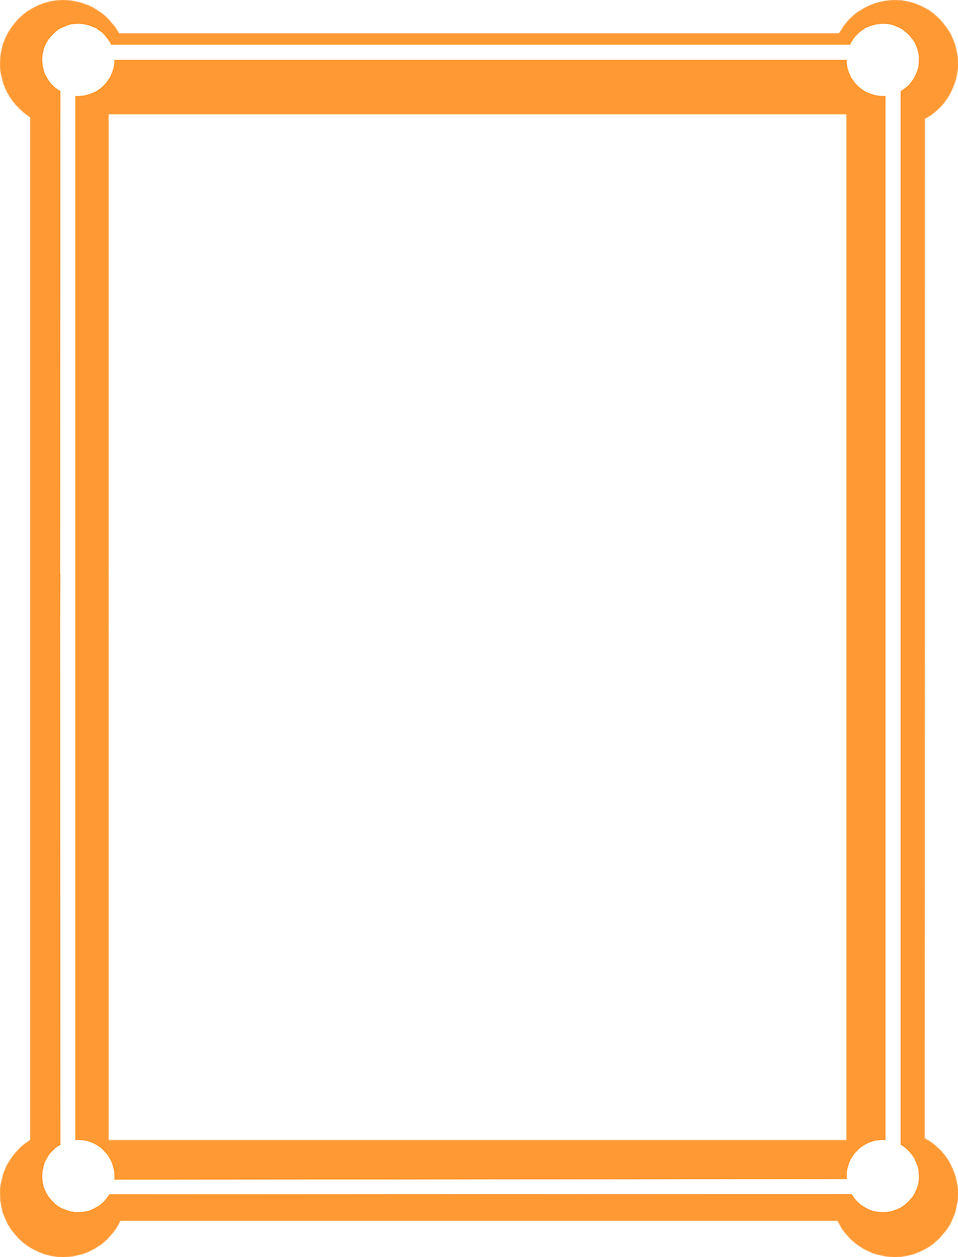 Frame clipart orange Free Orange Photo blank Border